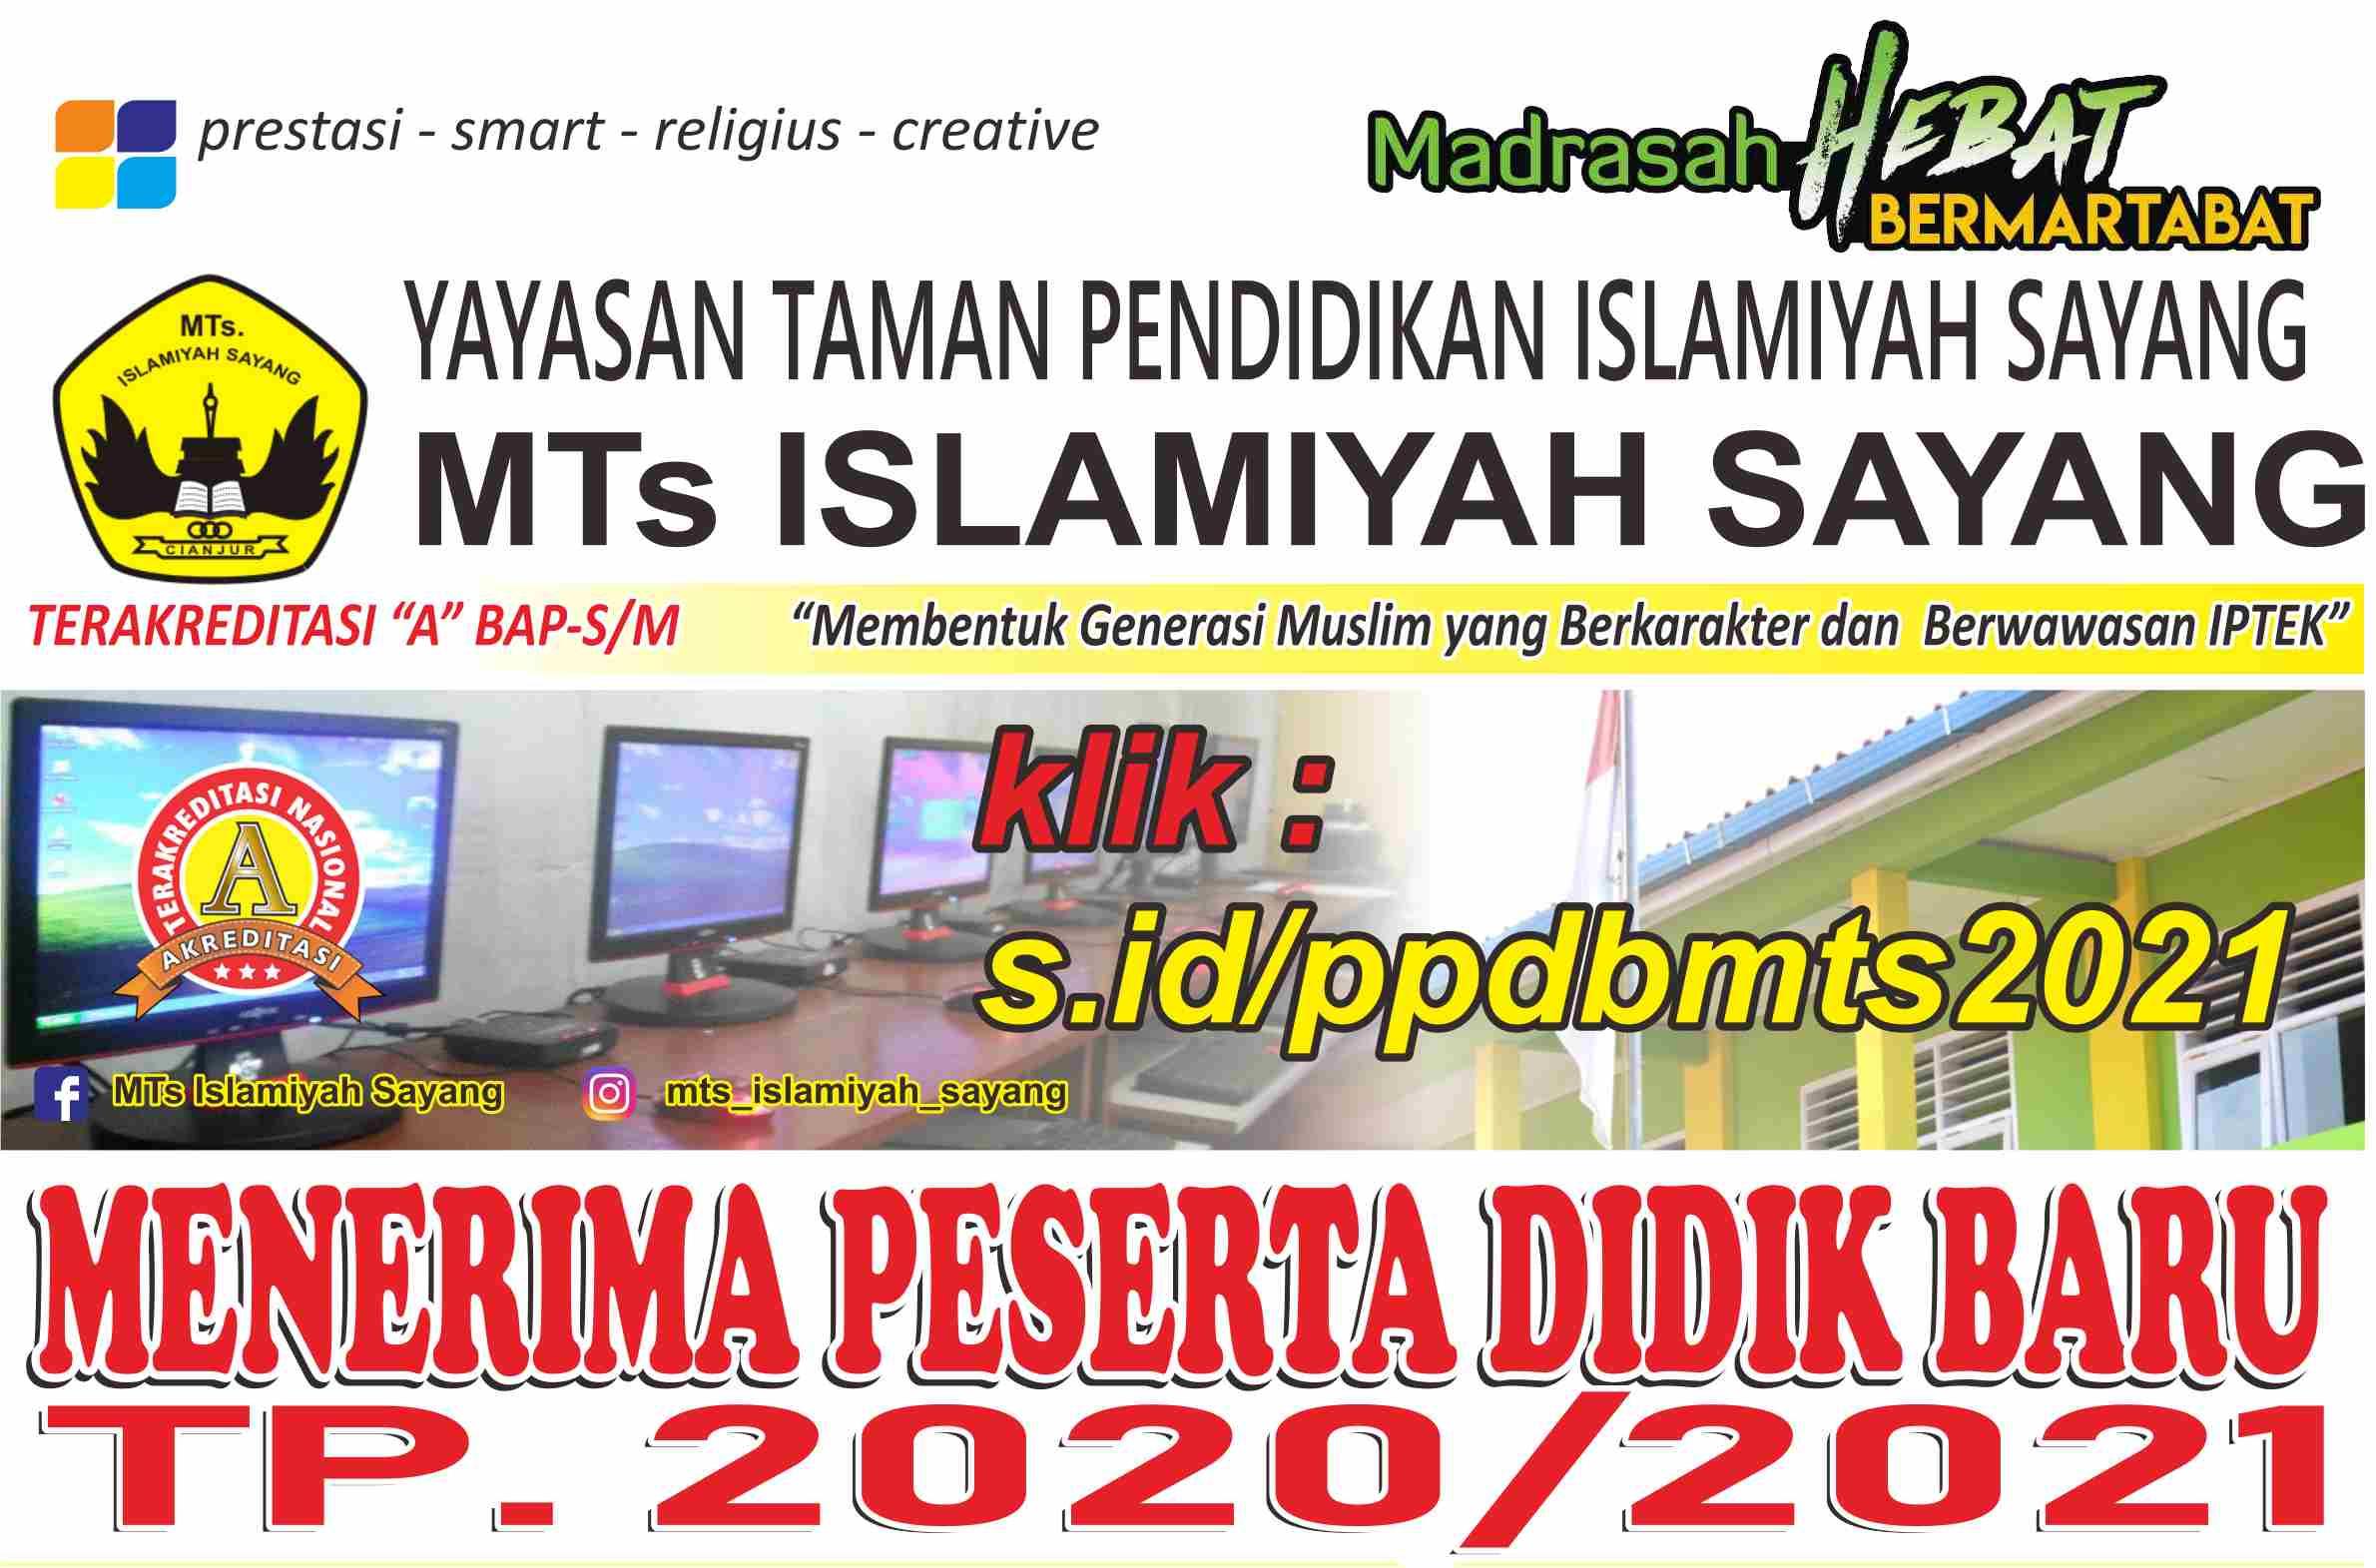 Penerimaan Peserta Didik Baru (PPDB) TP 2020-2021